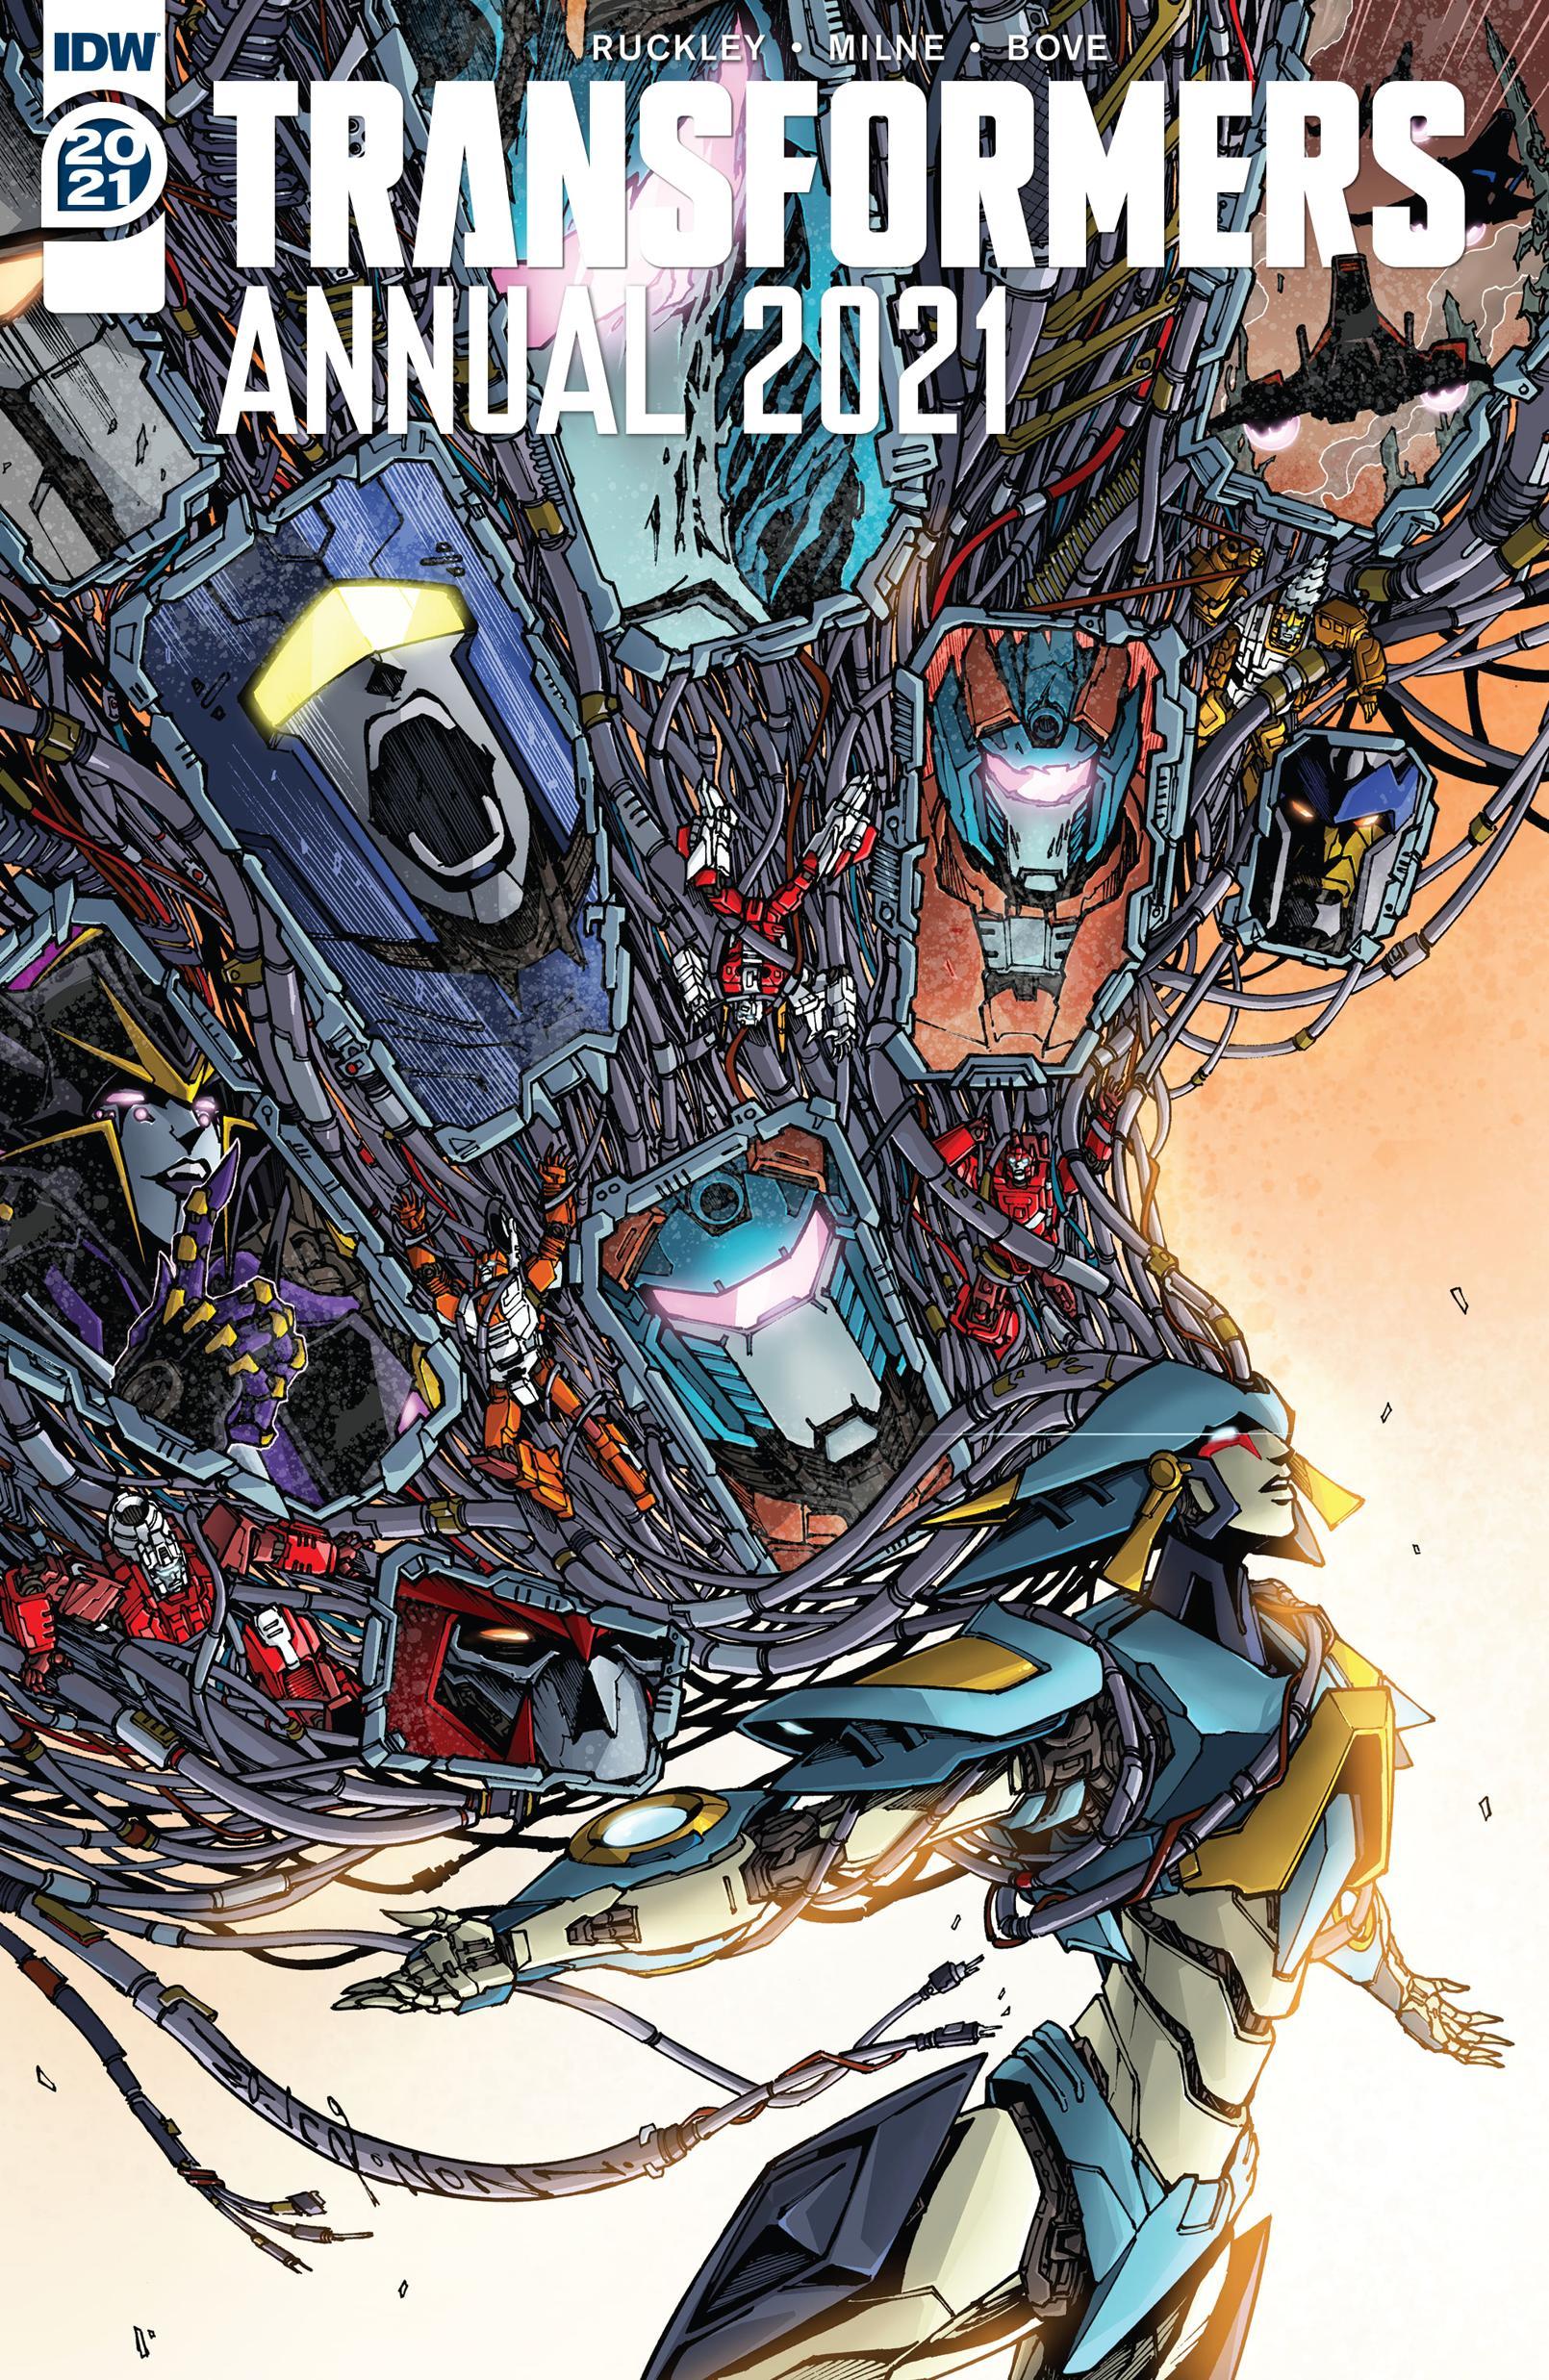 Transformers Annual 2021 (2021) (digital) (Knight Ripper-Empire